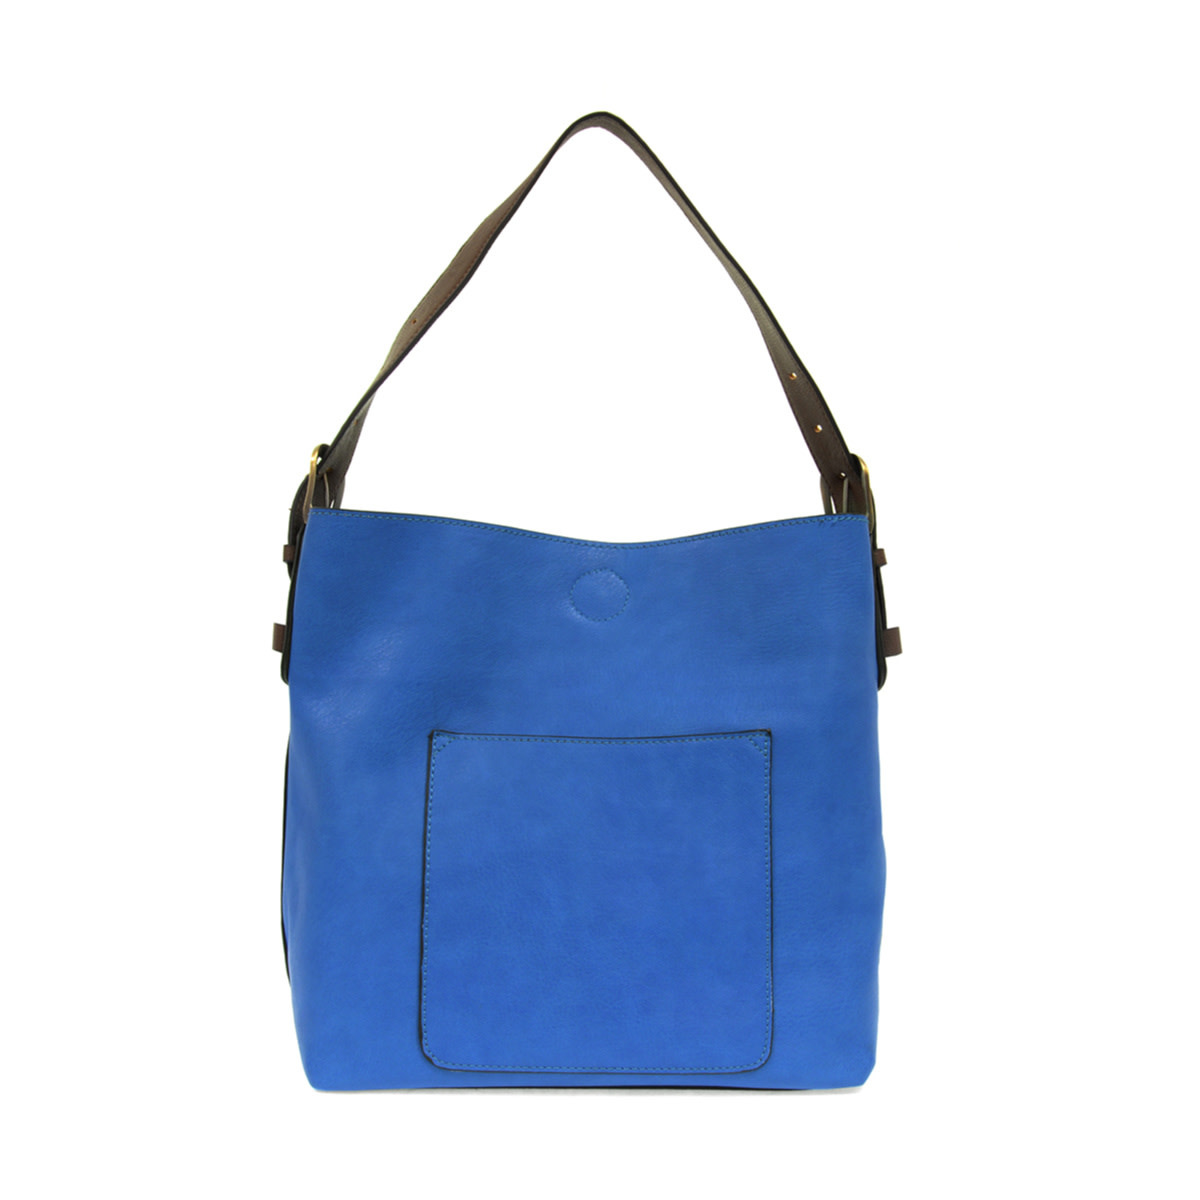 Joy Susan Joy Susan Classic Hobo Handbag Mosaic Blue